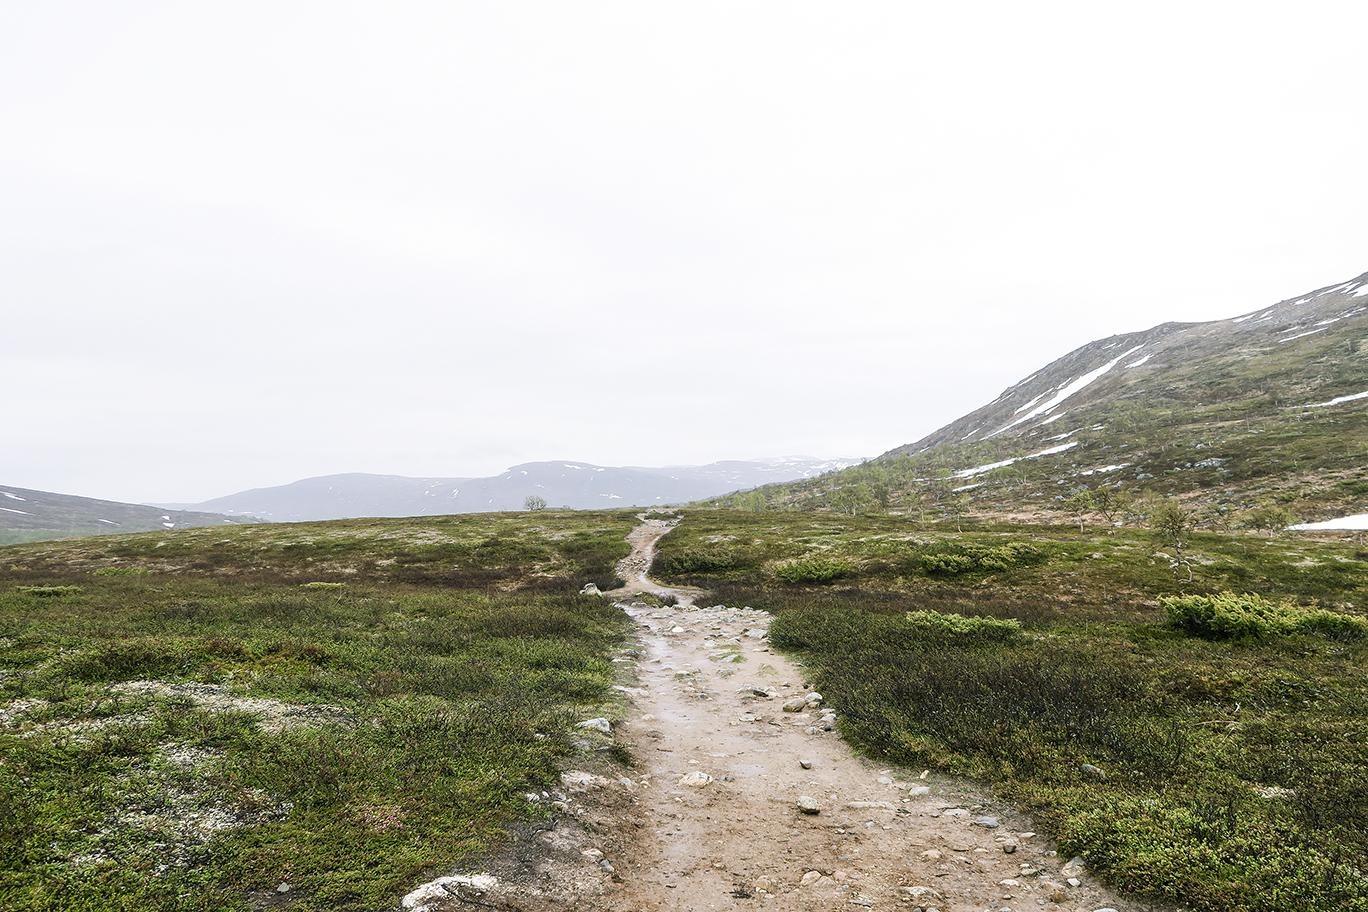 Storulvån www.traningsgladje.se